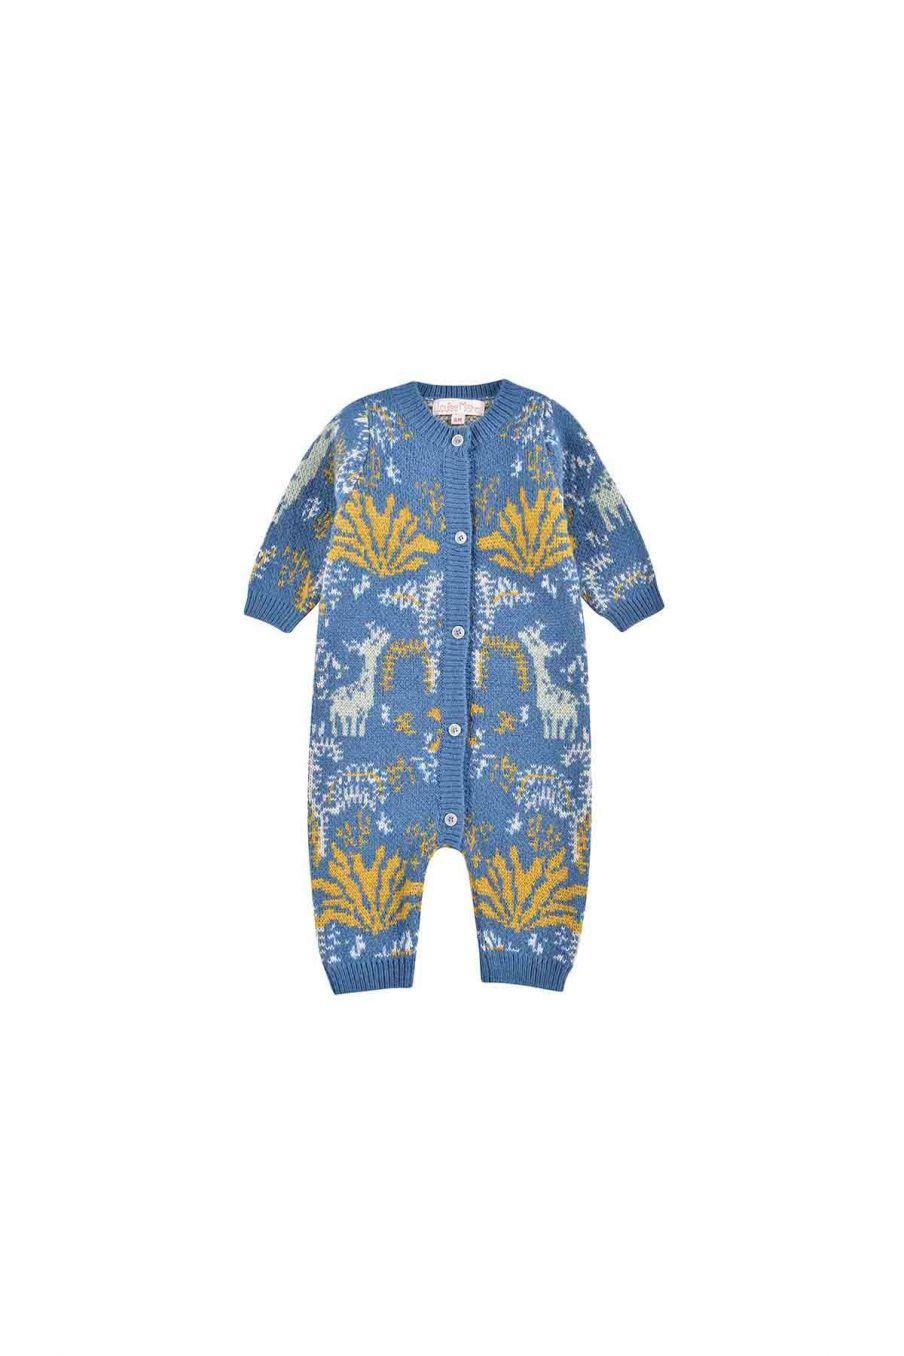 combinaison bebe garcon hubert blue forest - louise misha